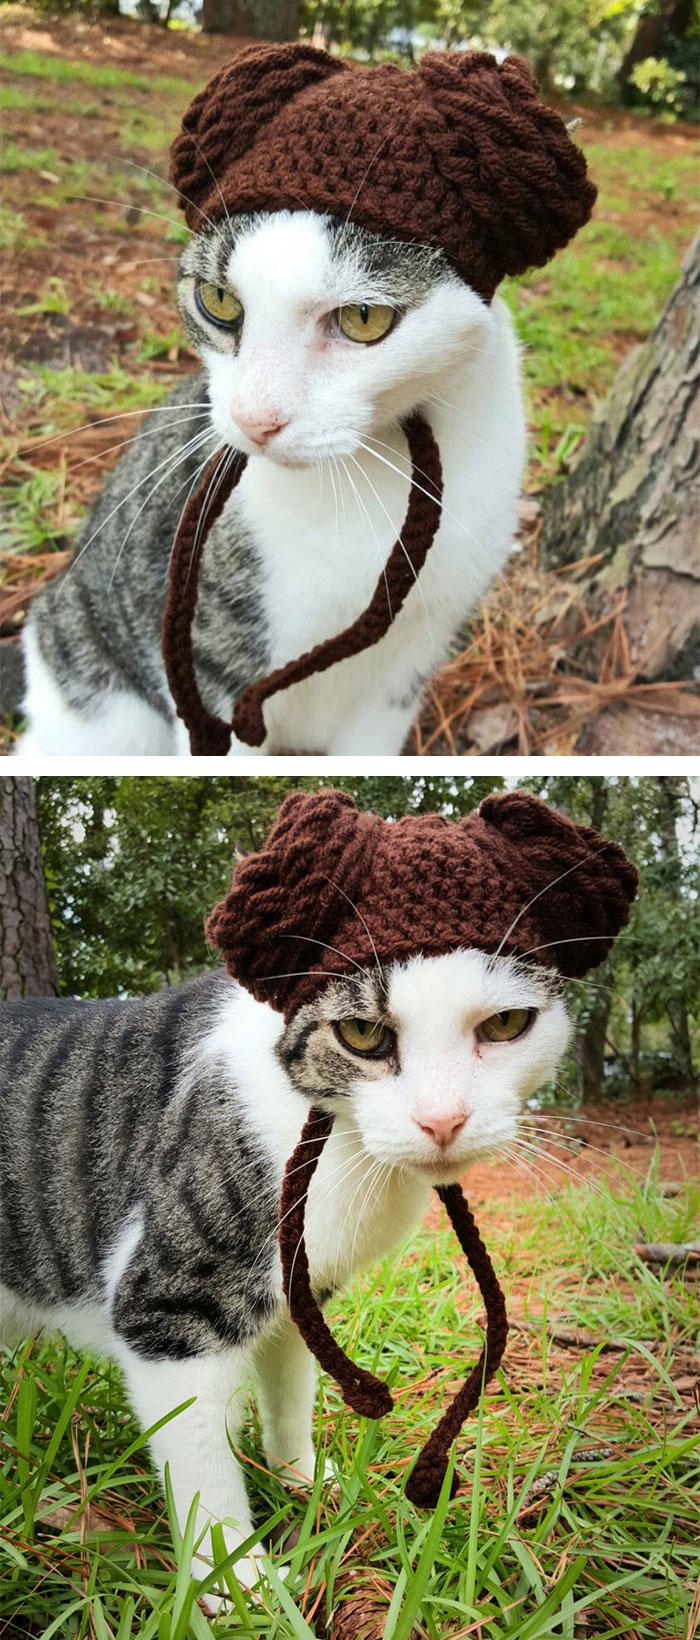 crochet-handmade-hats-pets-iheartneedlework-3__700